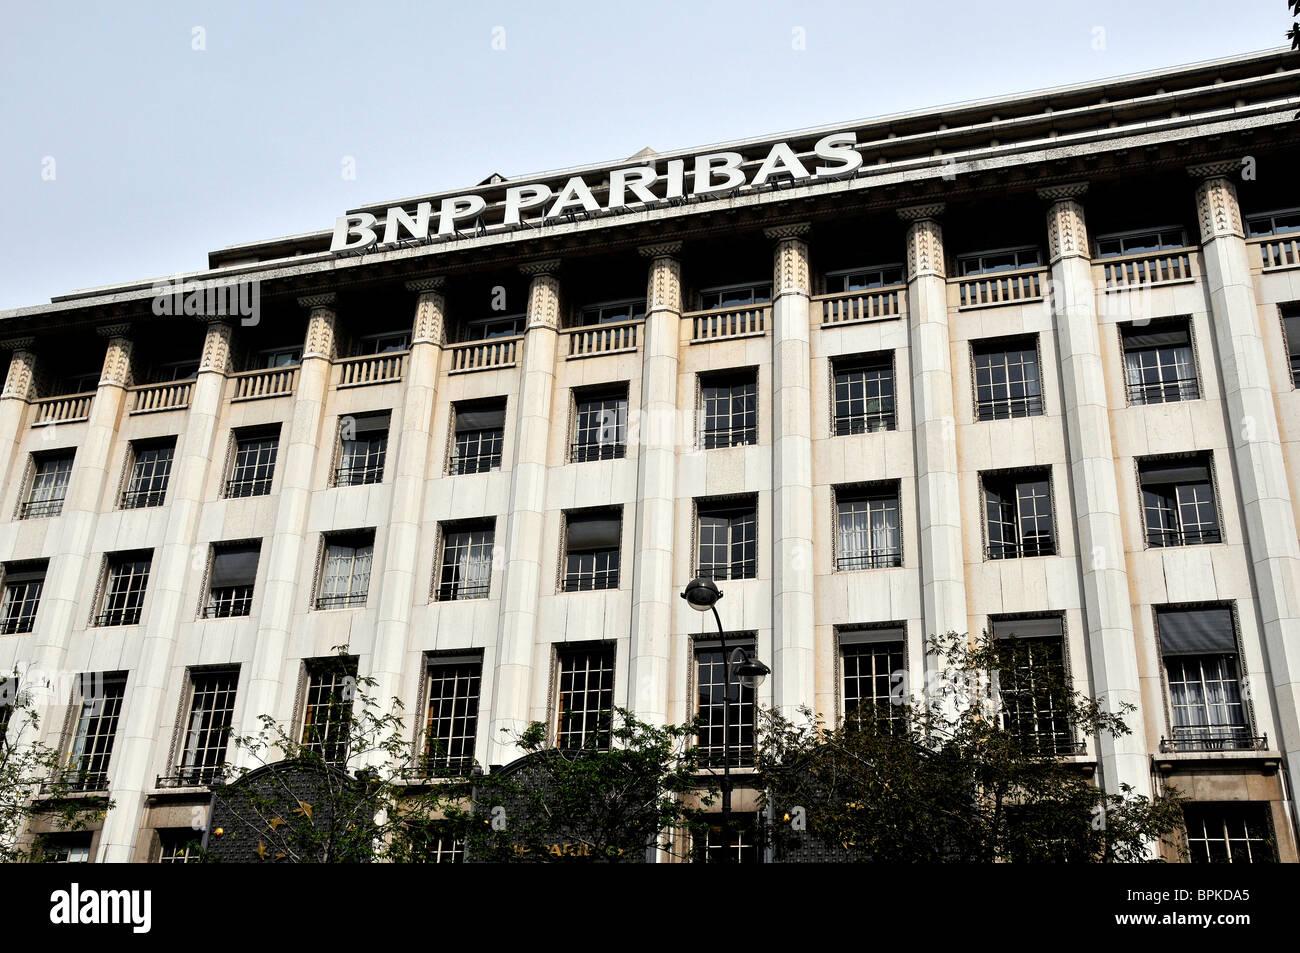 BNP PARIBAS Bank, Paris, Frankreich Stockbild